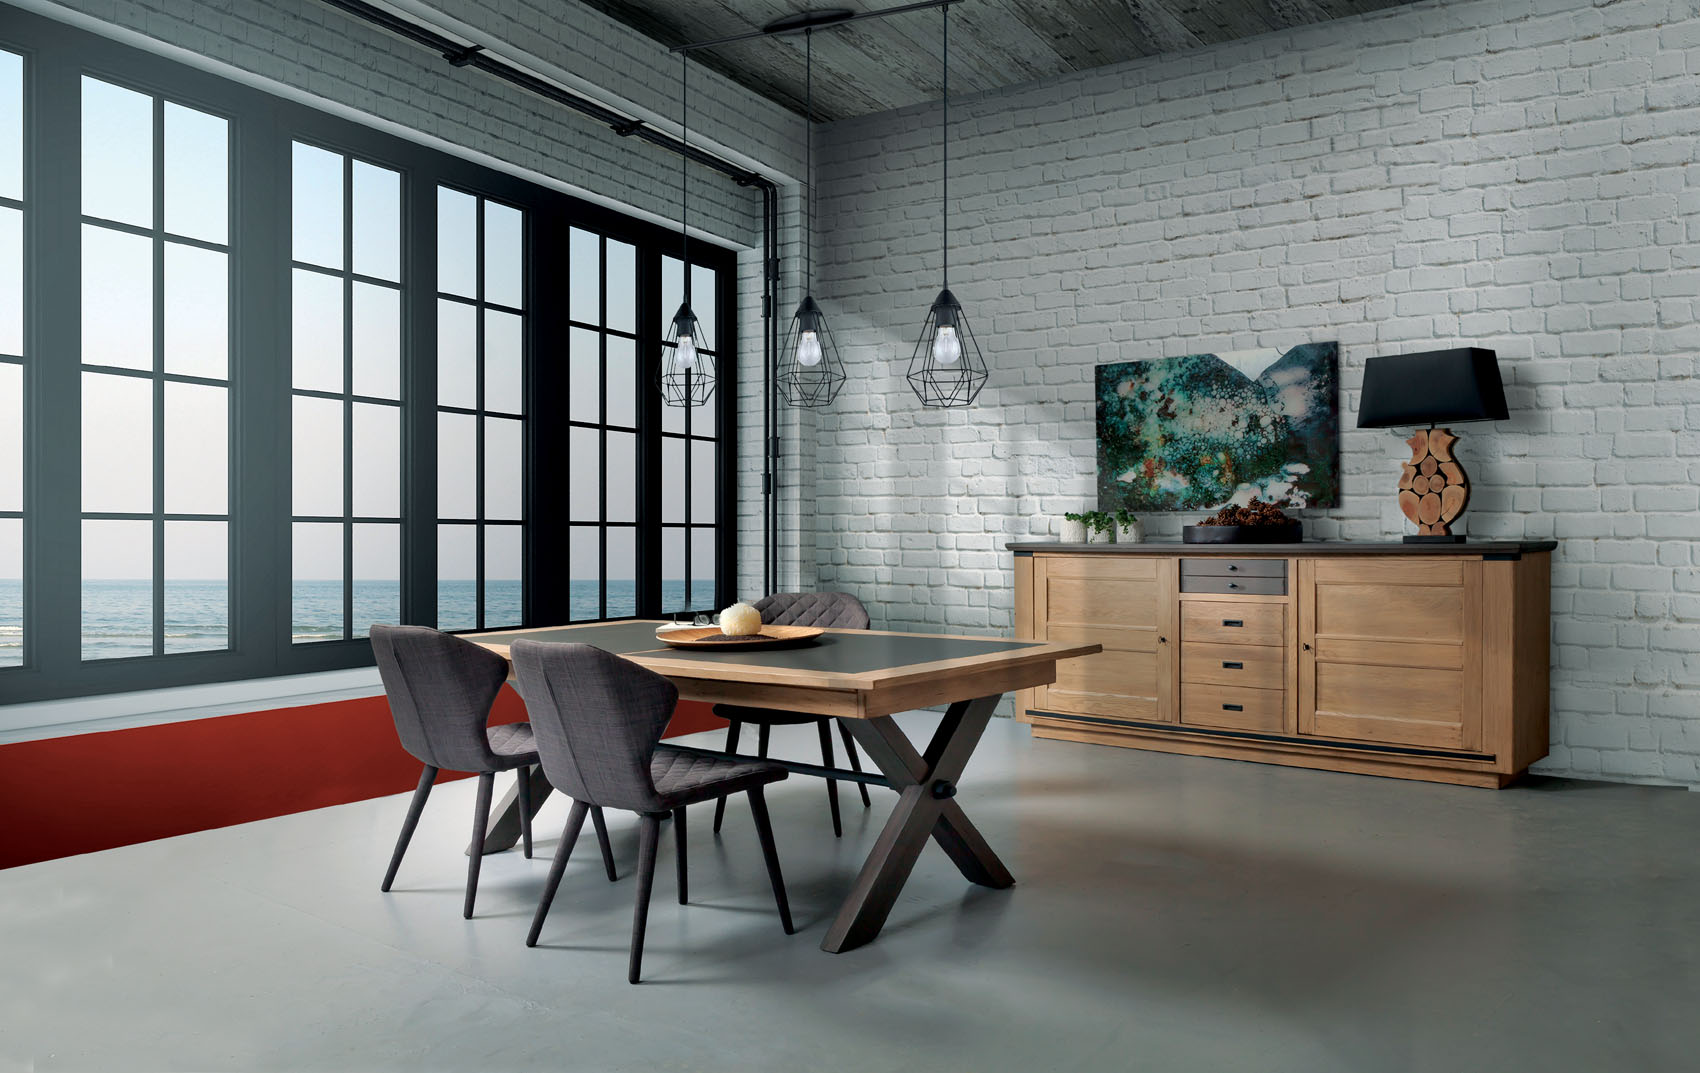 Meuble salle a manger magellan ateliers de langres meubles for Meuble salle a manger 1900